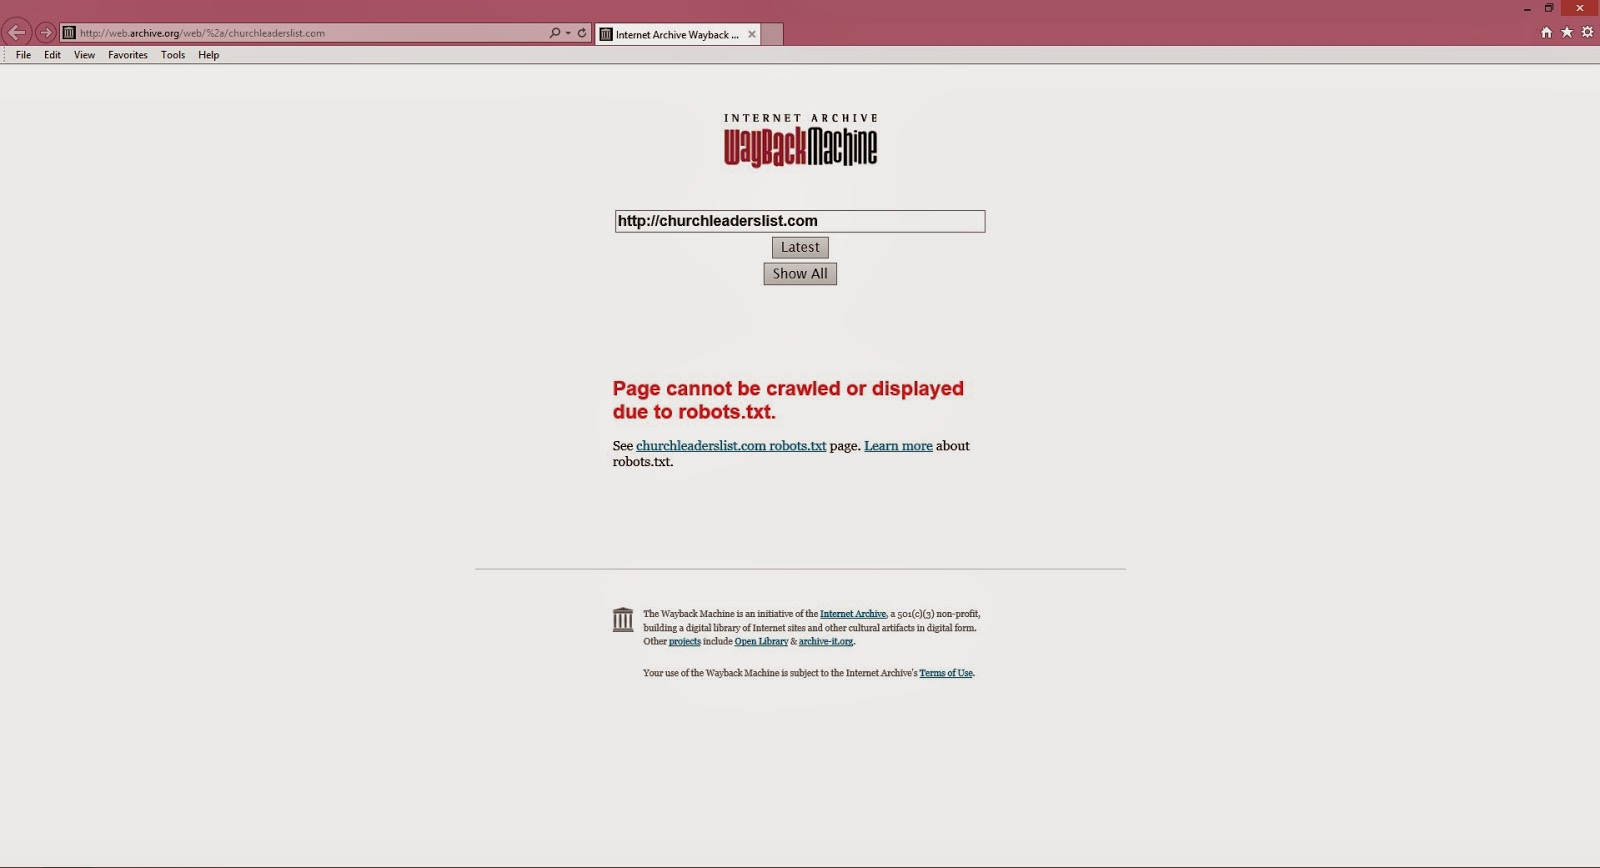 WenatcheeTheHatchet: WayBack Machine Results For